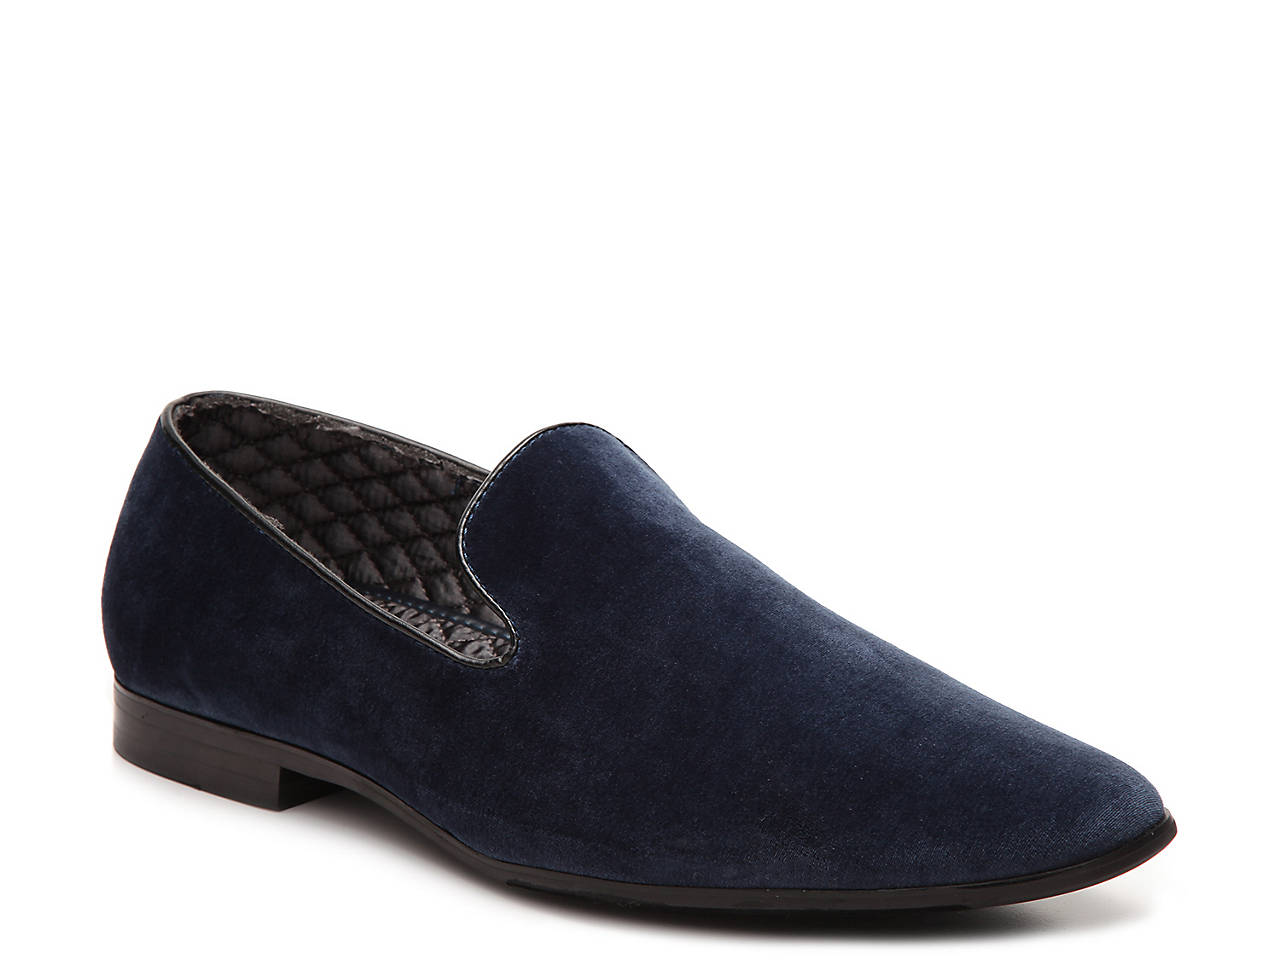 Buy Cheap Giorgio Brutini Men's Cress Mens Navy Velvet Giorgio Brutini Mens Slip Ons